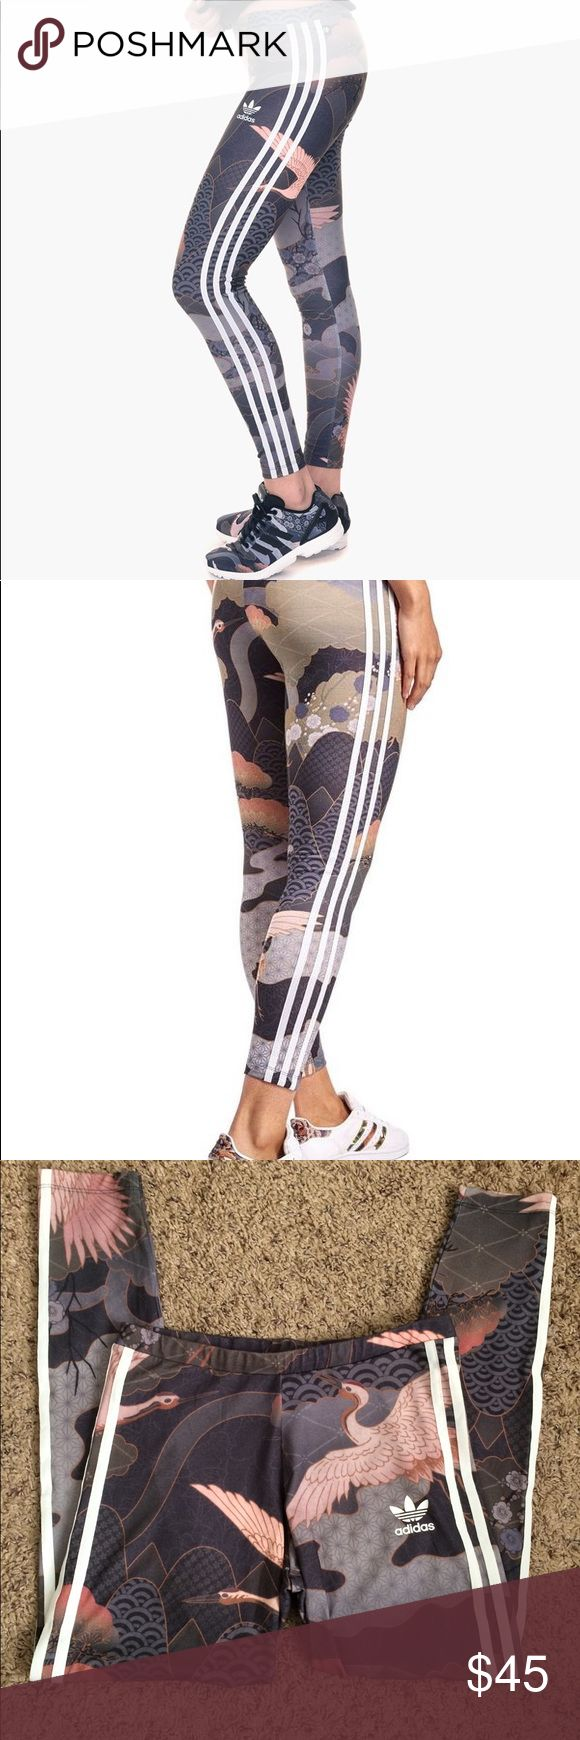 Adidas Originals Kimono Print Rita Ora Leggings From the Adidas Originals Rita Ora Line Circa 2016. Limited Edition! No longer available in stores! Comes from smoke free and pet free home Adidas by Rita Ora Pants Leggings